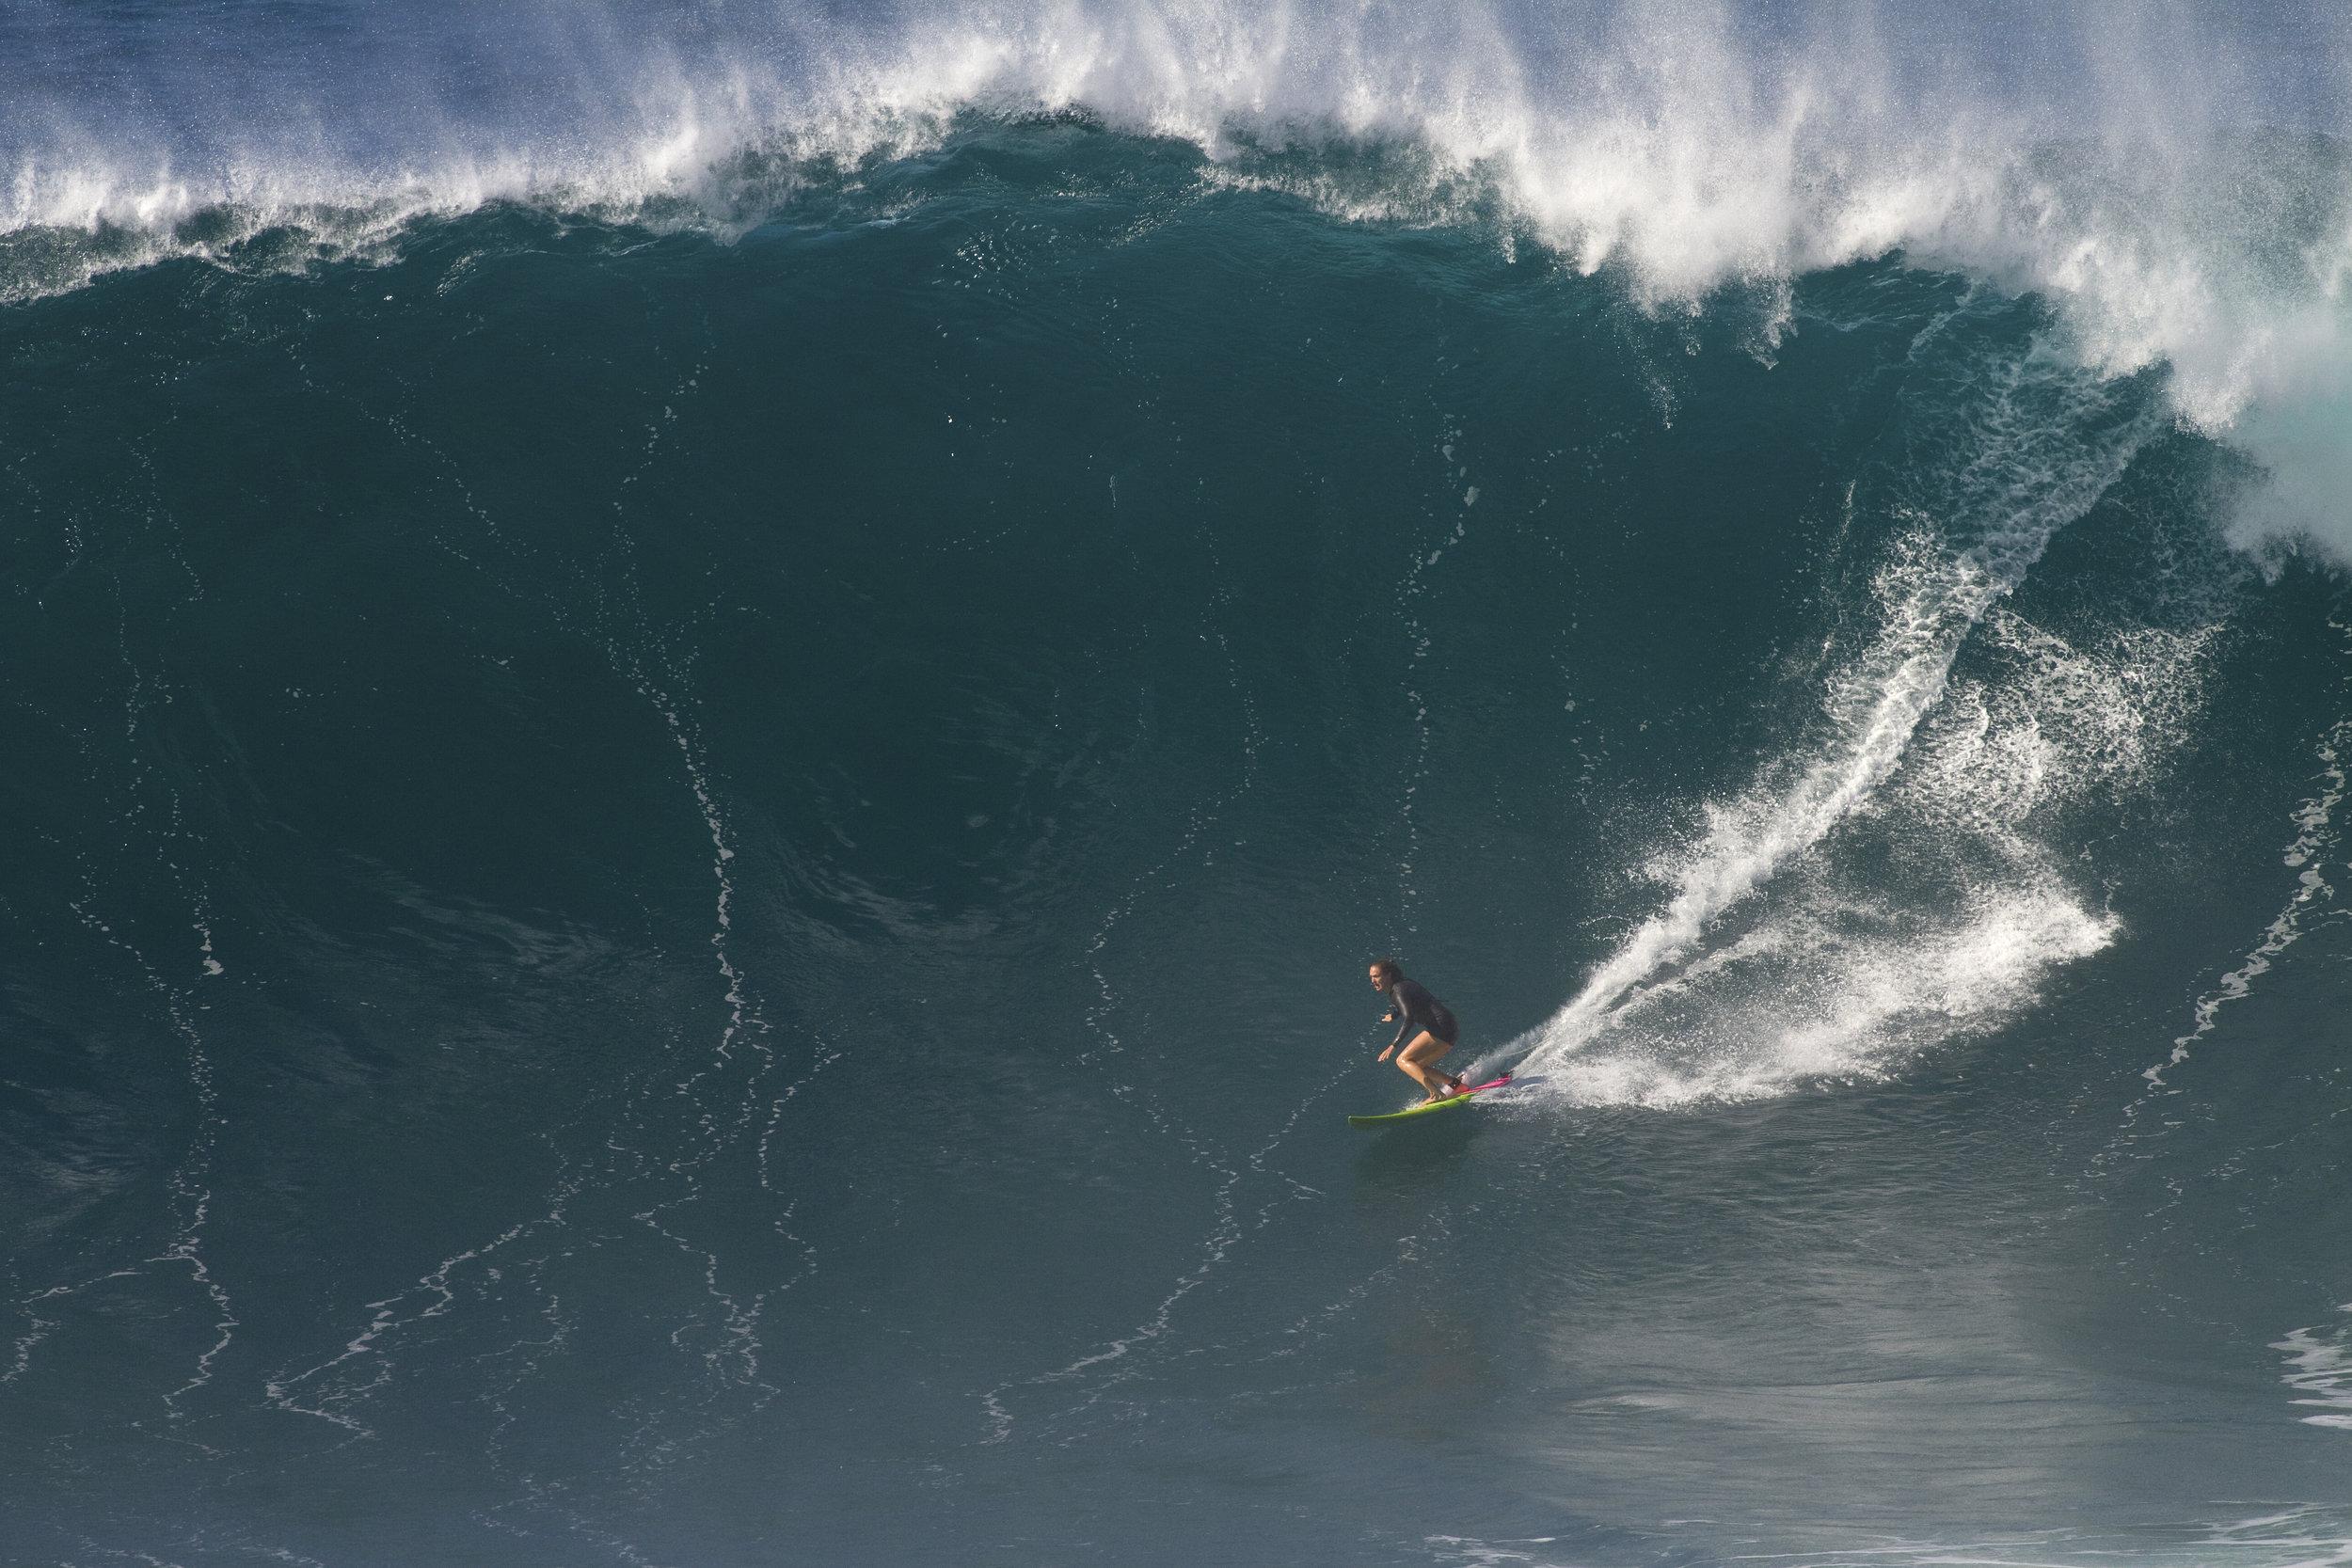 Paige Alms Big Wave Wall.jpg